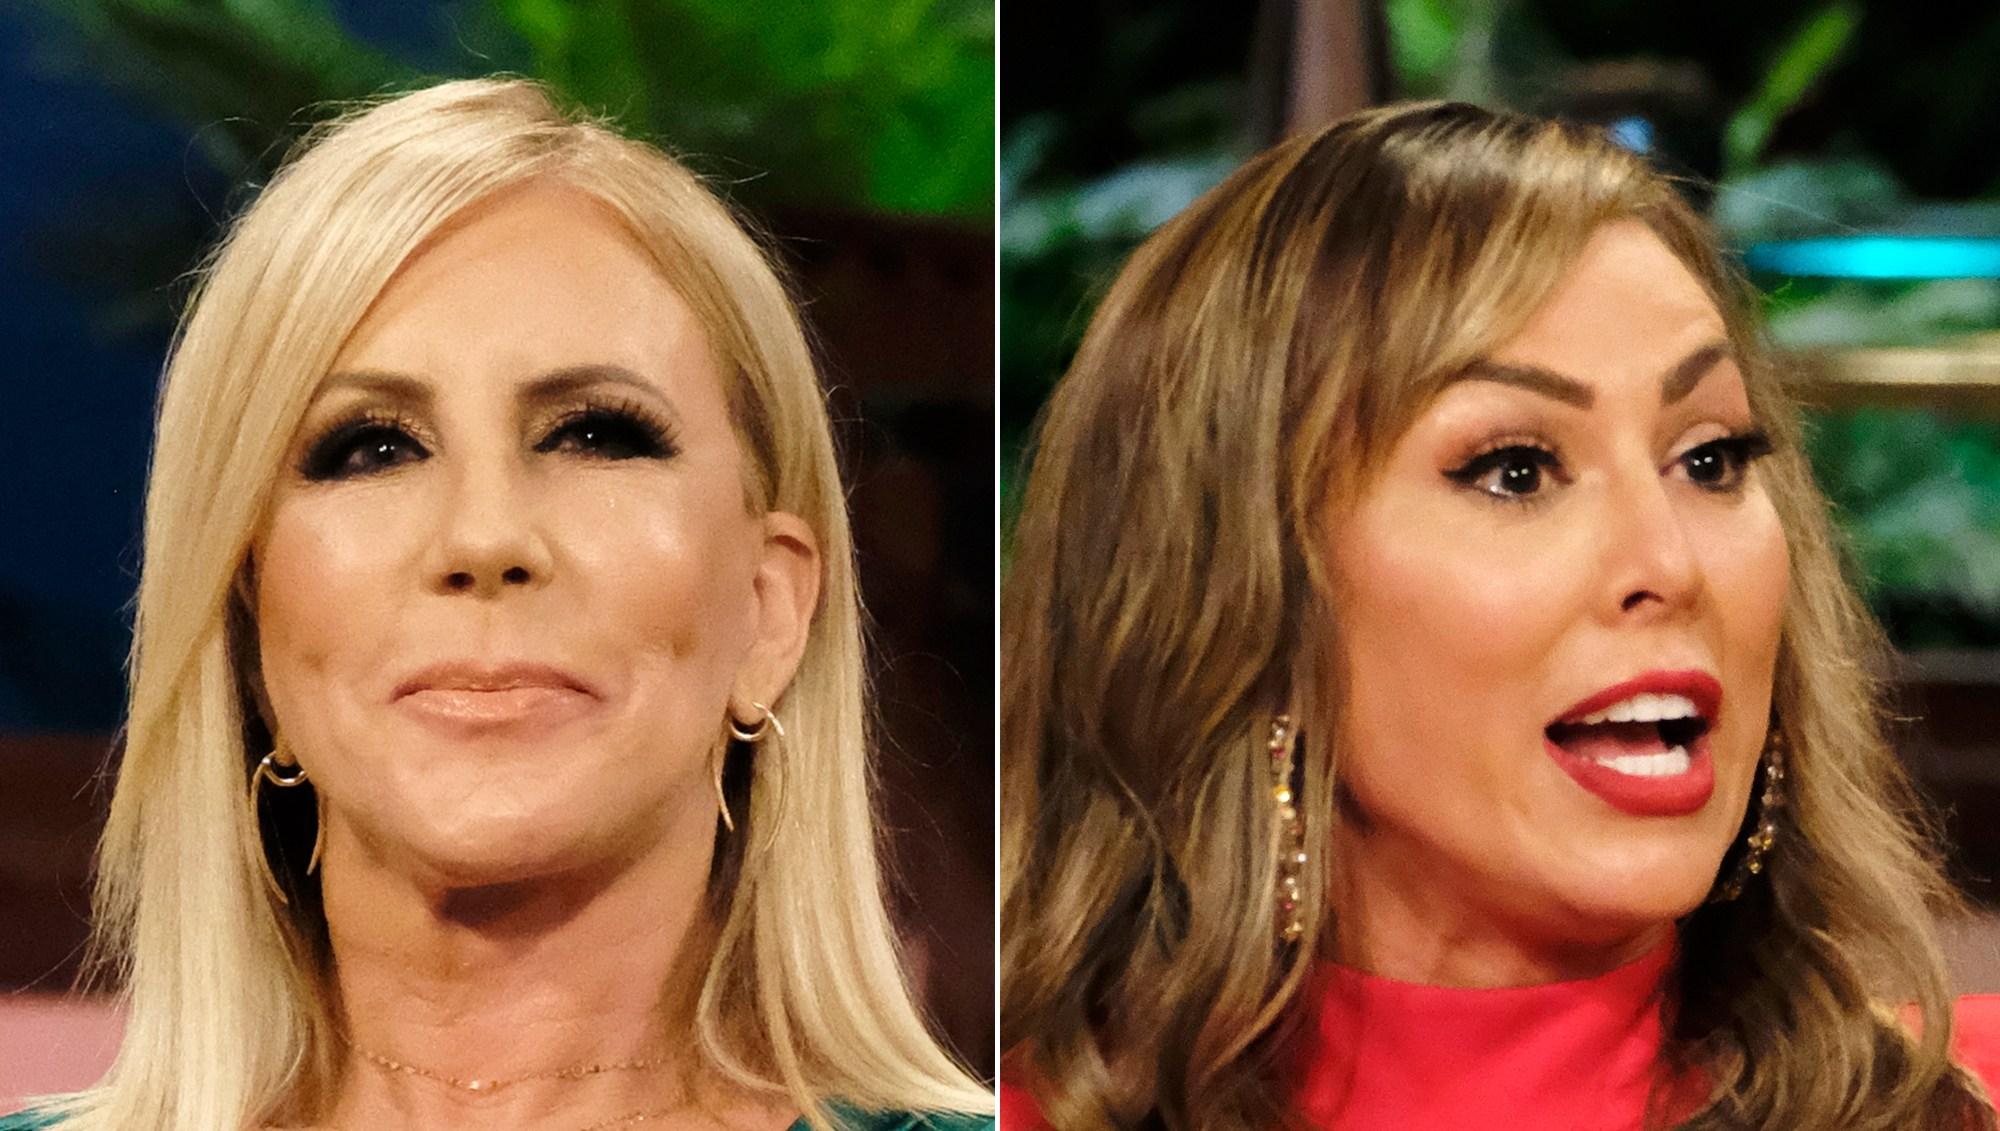 'RHOC' Reunion Sneak Peek: Vicki Gunvalson Accuses Kelly Dodd of Doing Cocaine